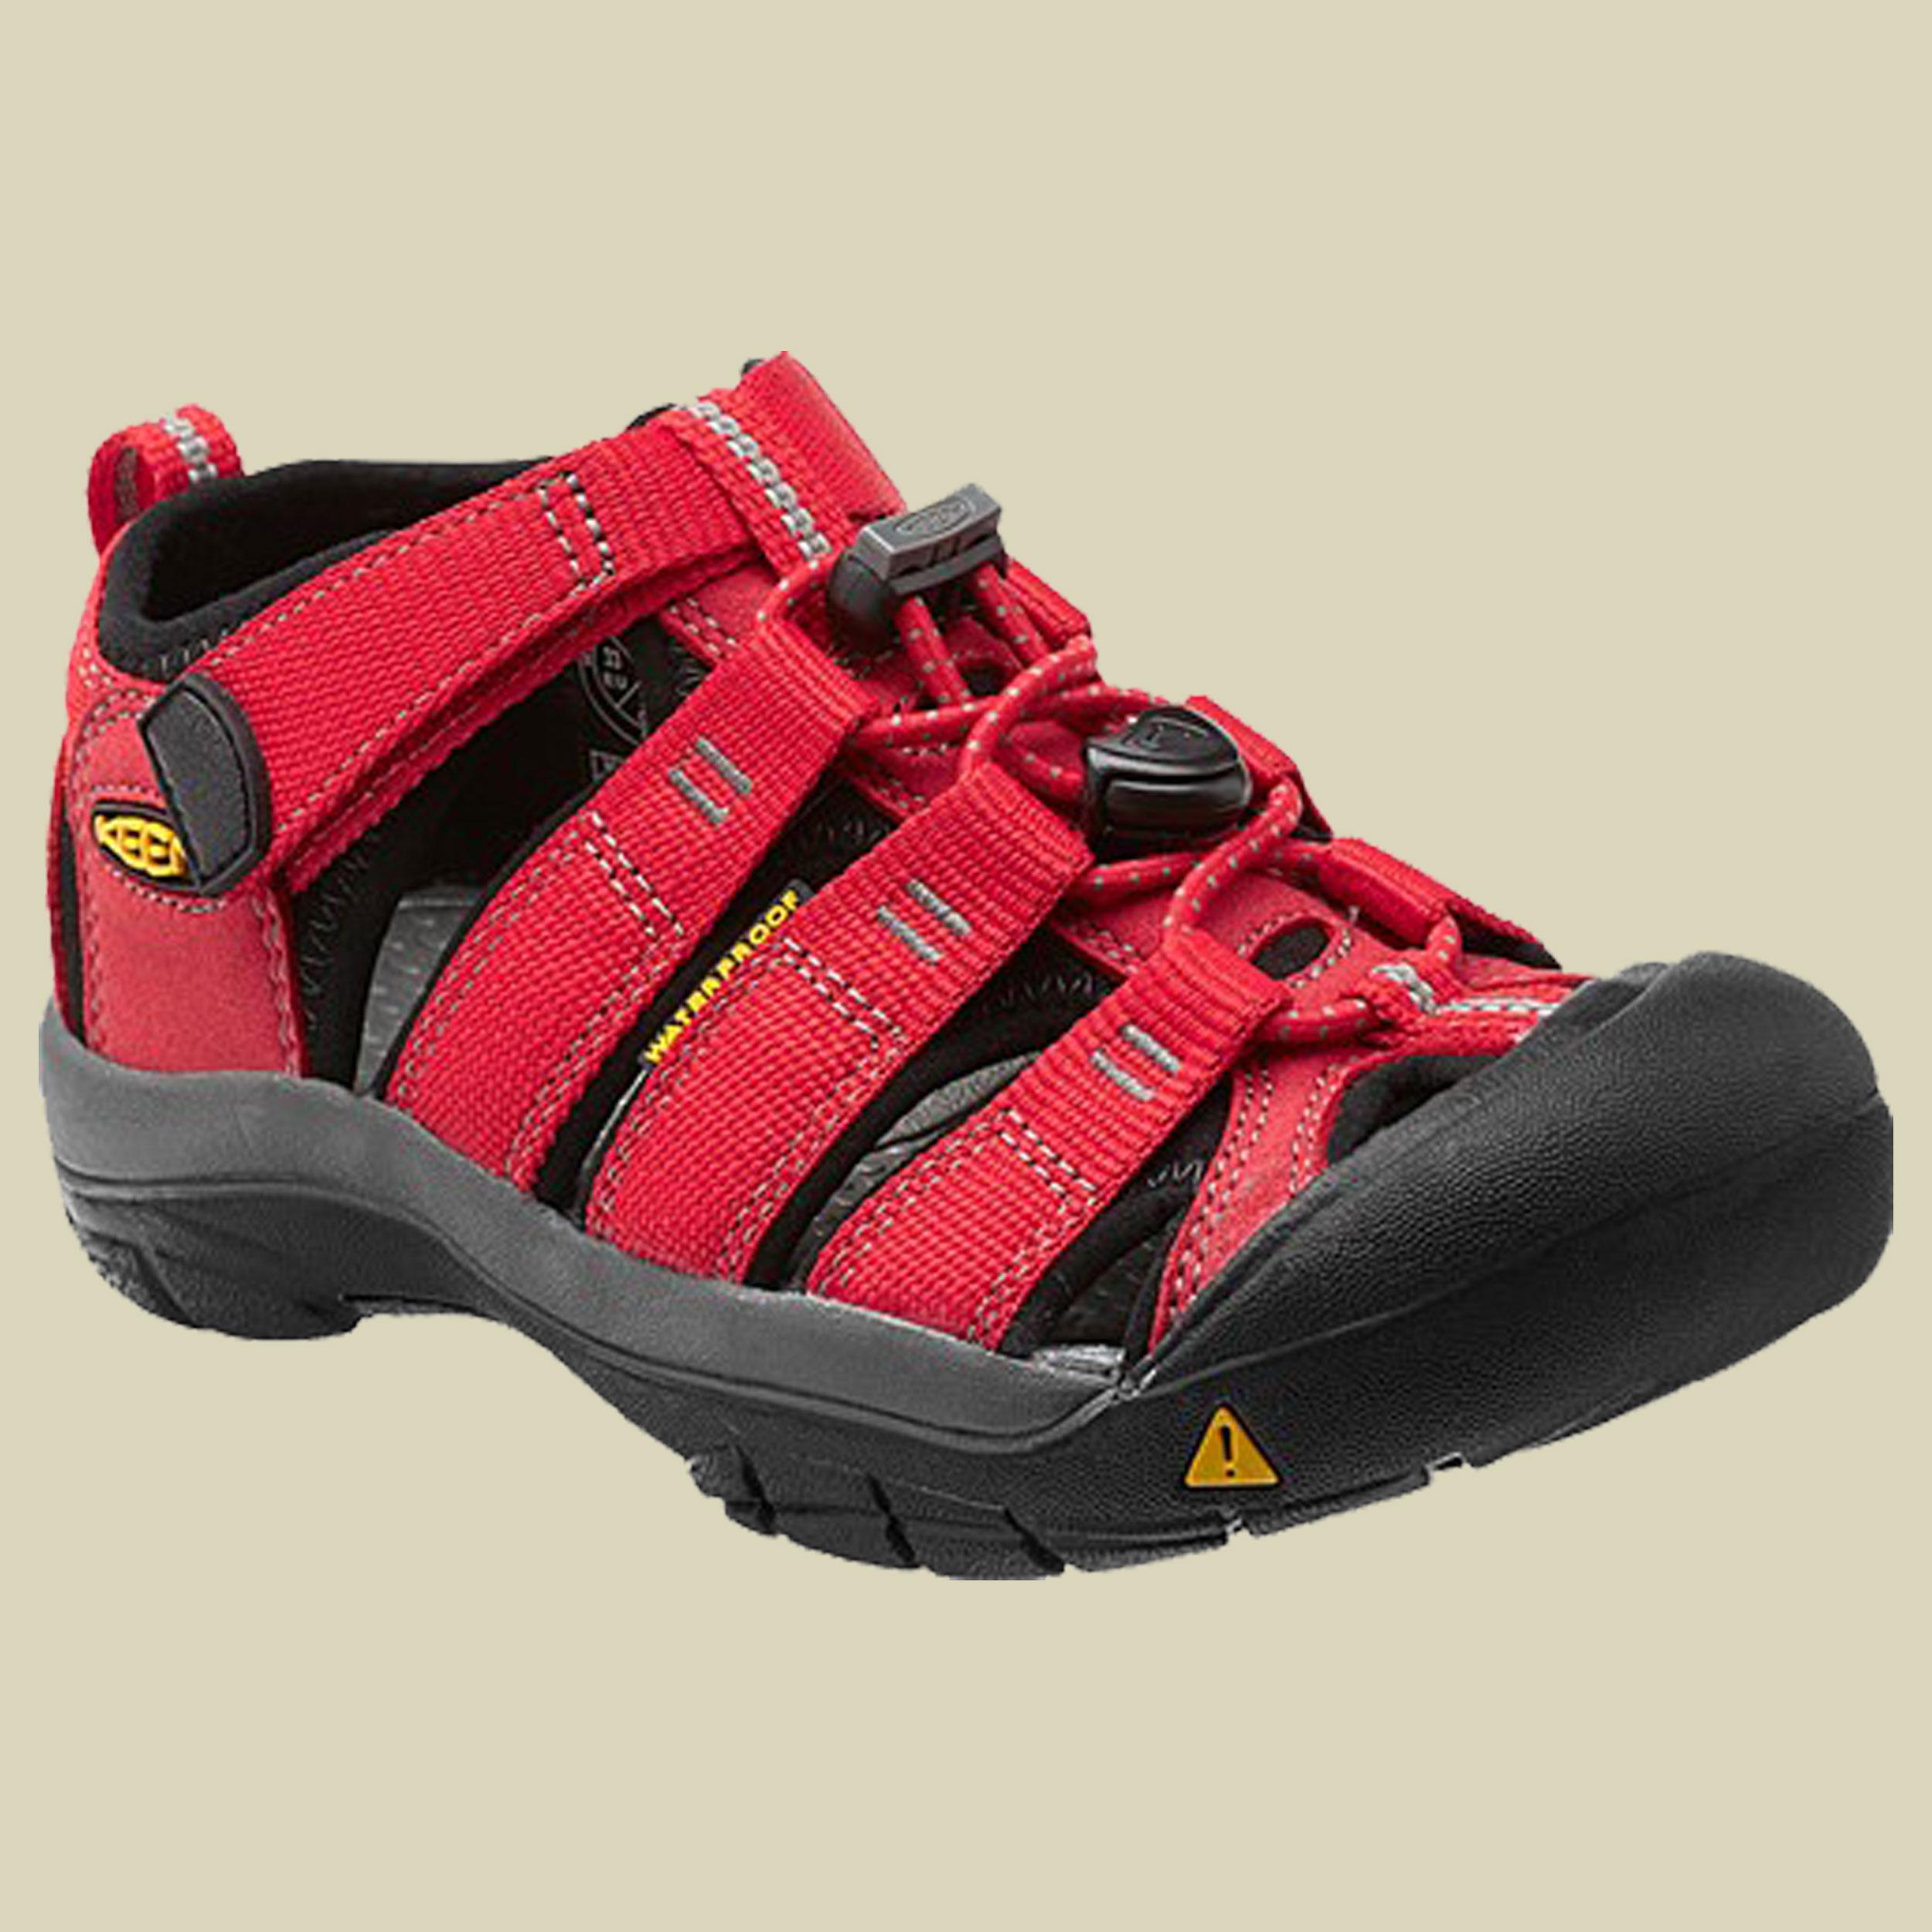 Keen Newport H2 Kids Trekking Sandale Kinder Größe 29 ribbon red-gargoyle